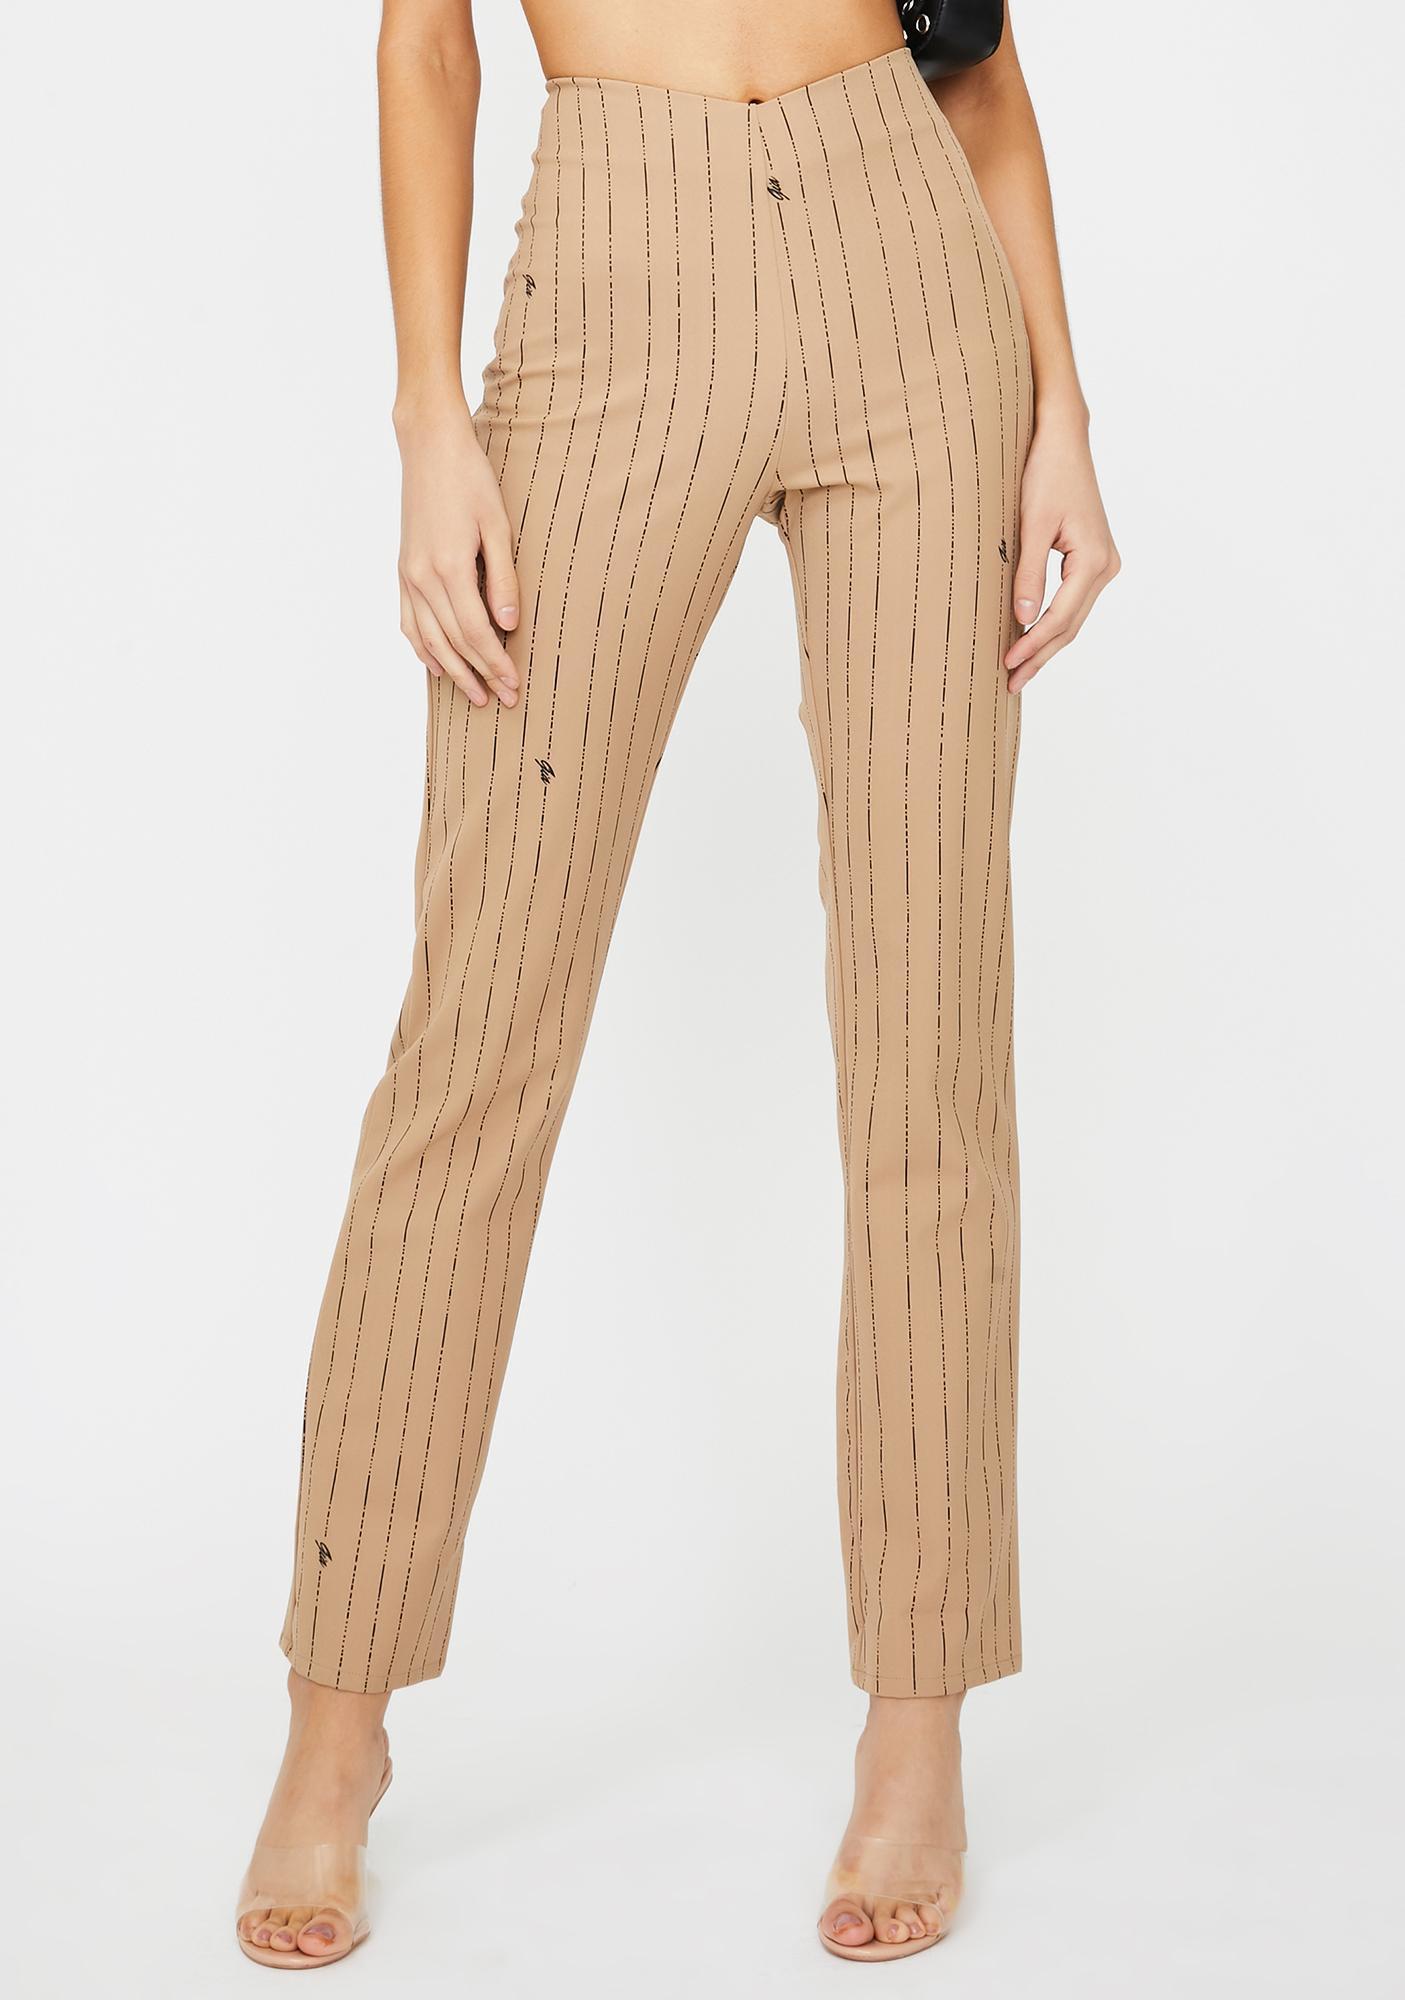 I AM GIA Dominique Pinstripe Pants